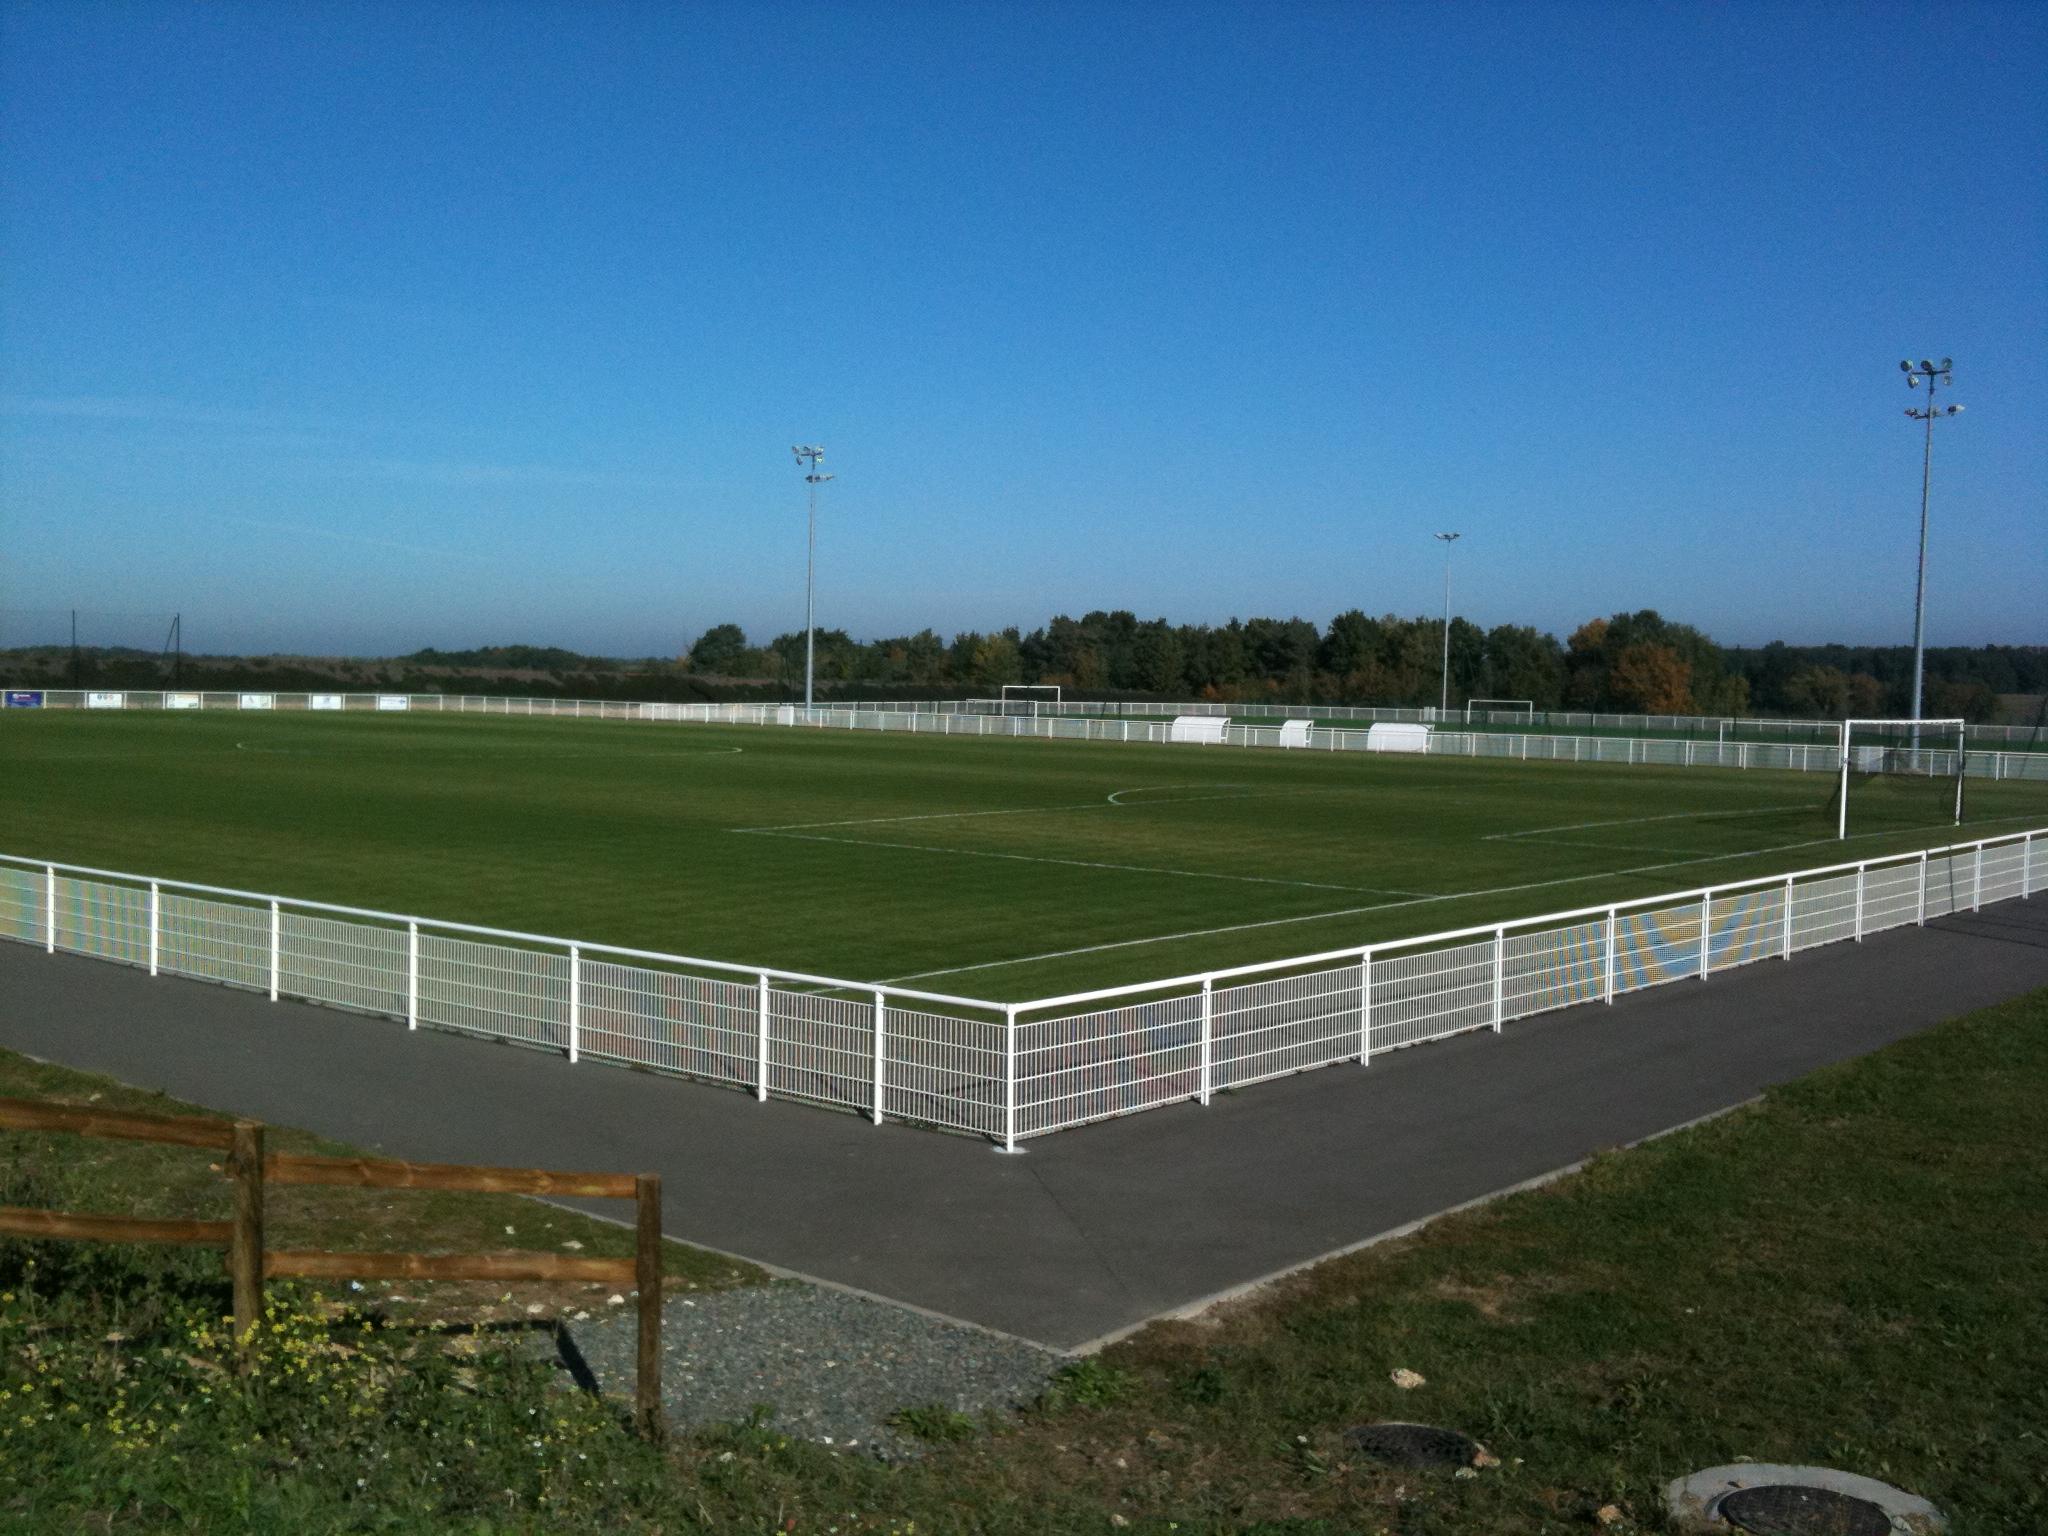 Terrain stade municipal de la loge club football sporting club azay cheille footeo - Camping azay le rideau municipal ...